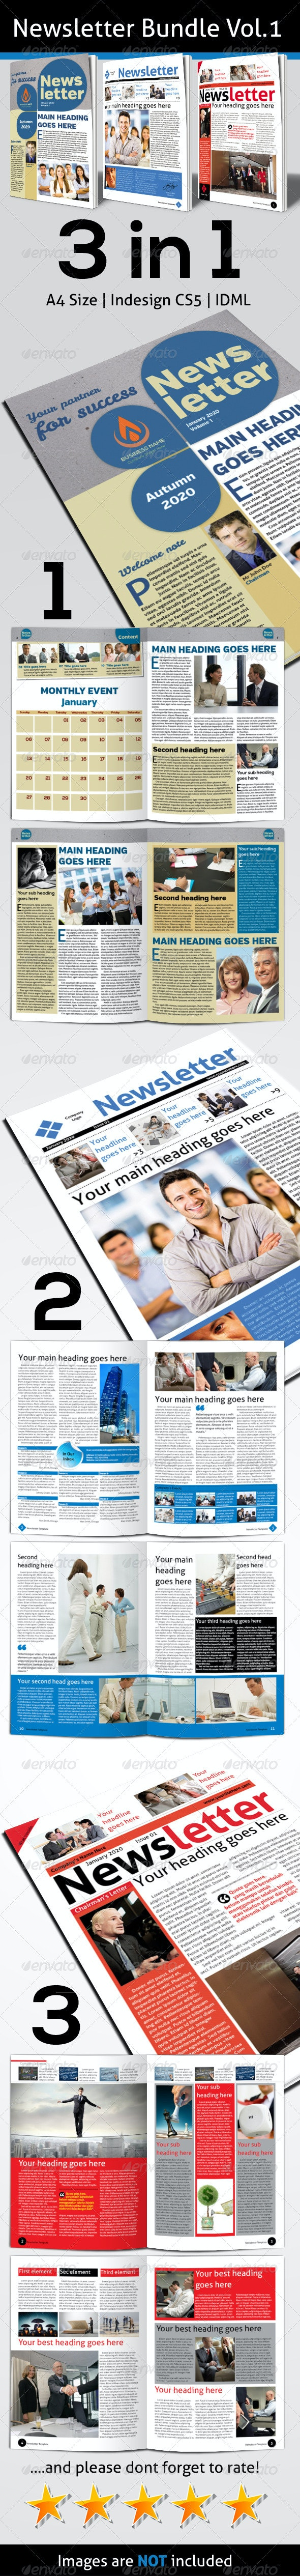 Newsletter Bundle Vol.1 - Newsletters Print Templates